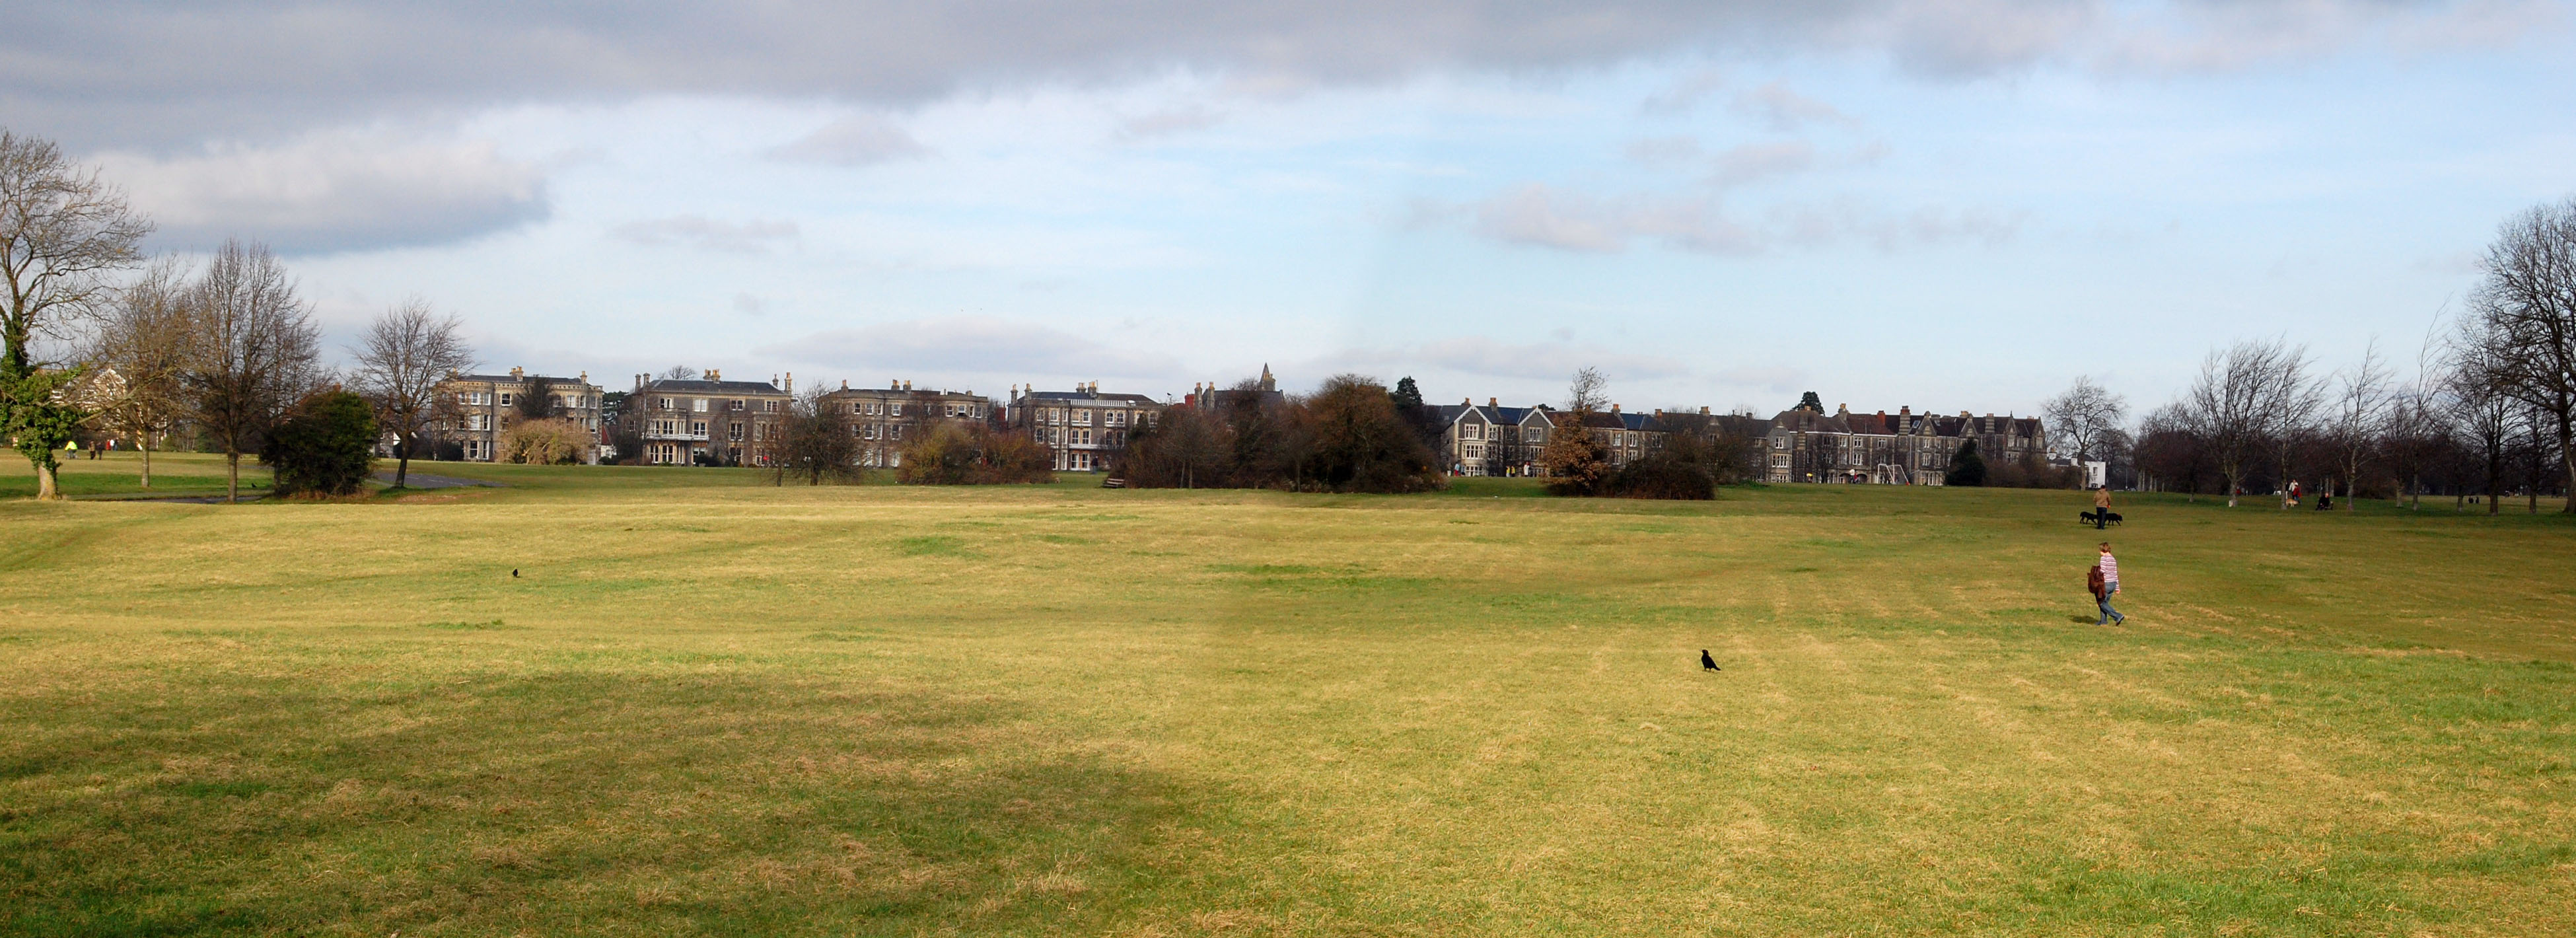 sneyd park